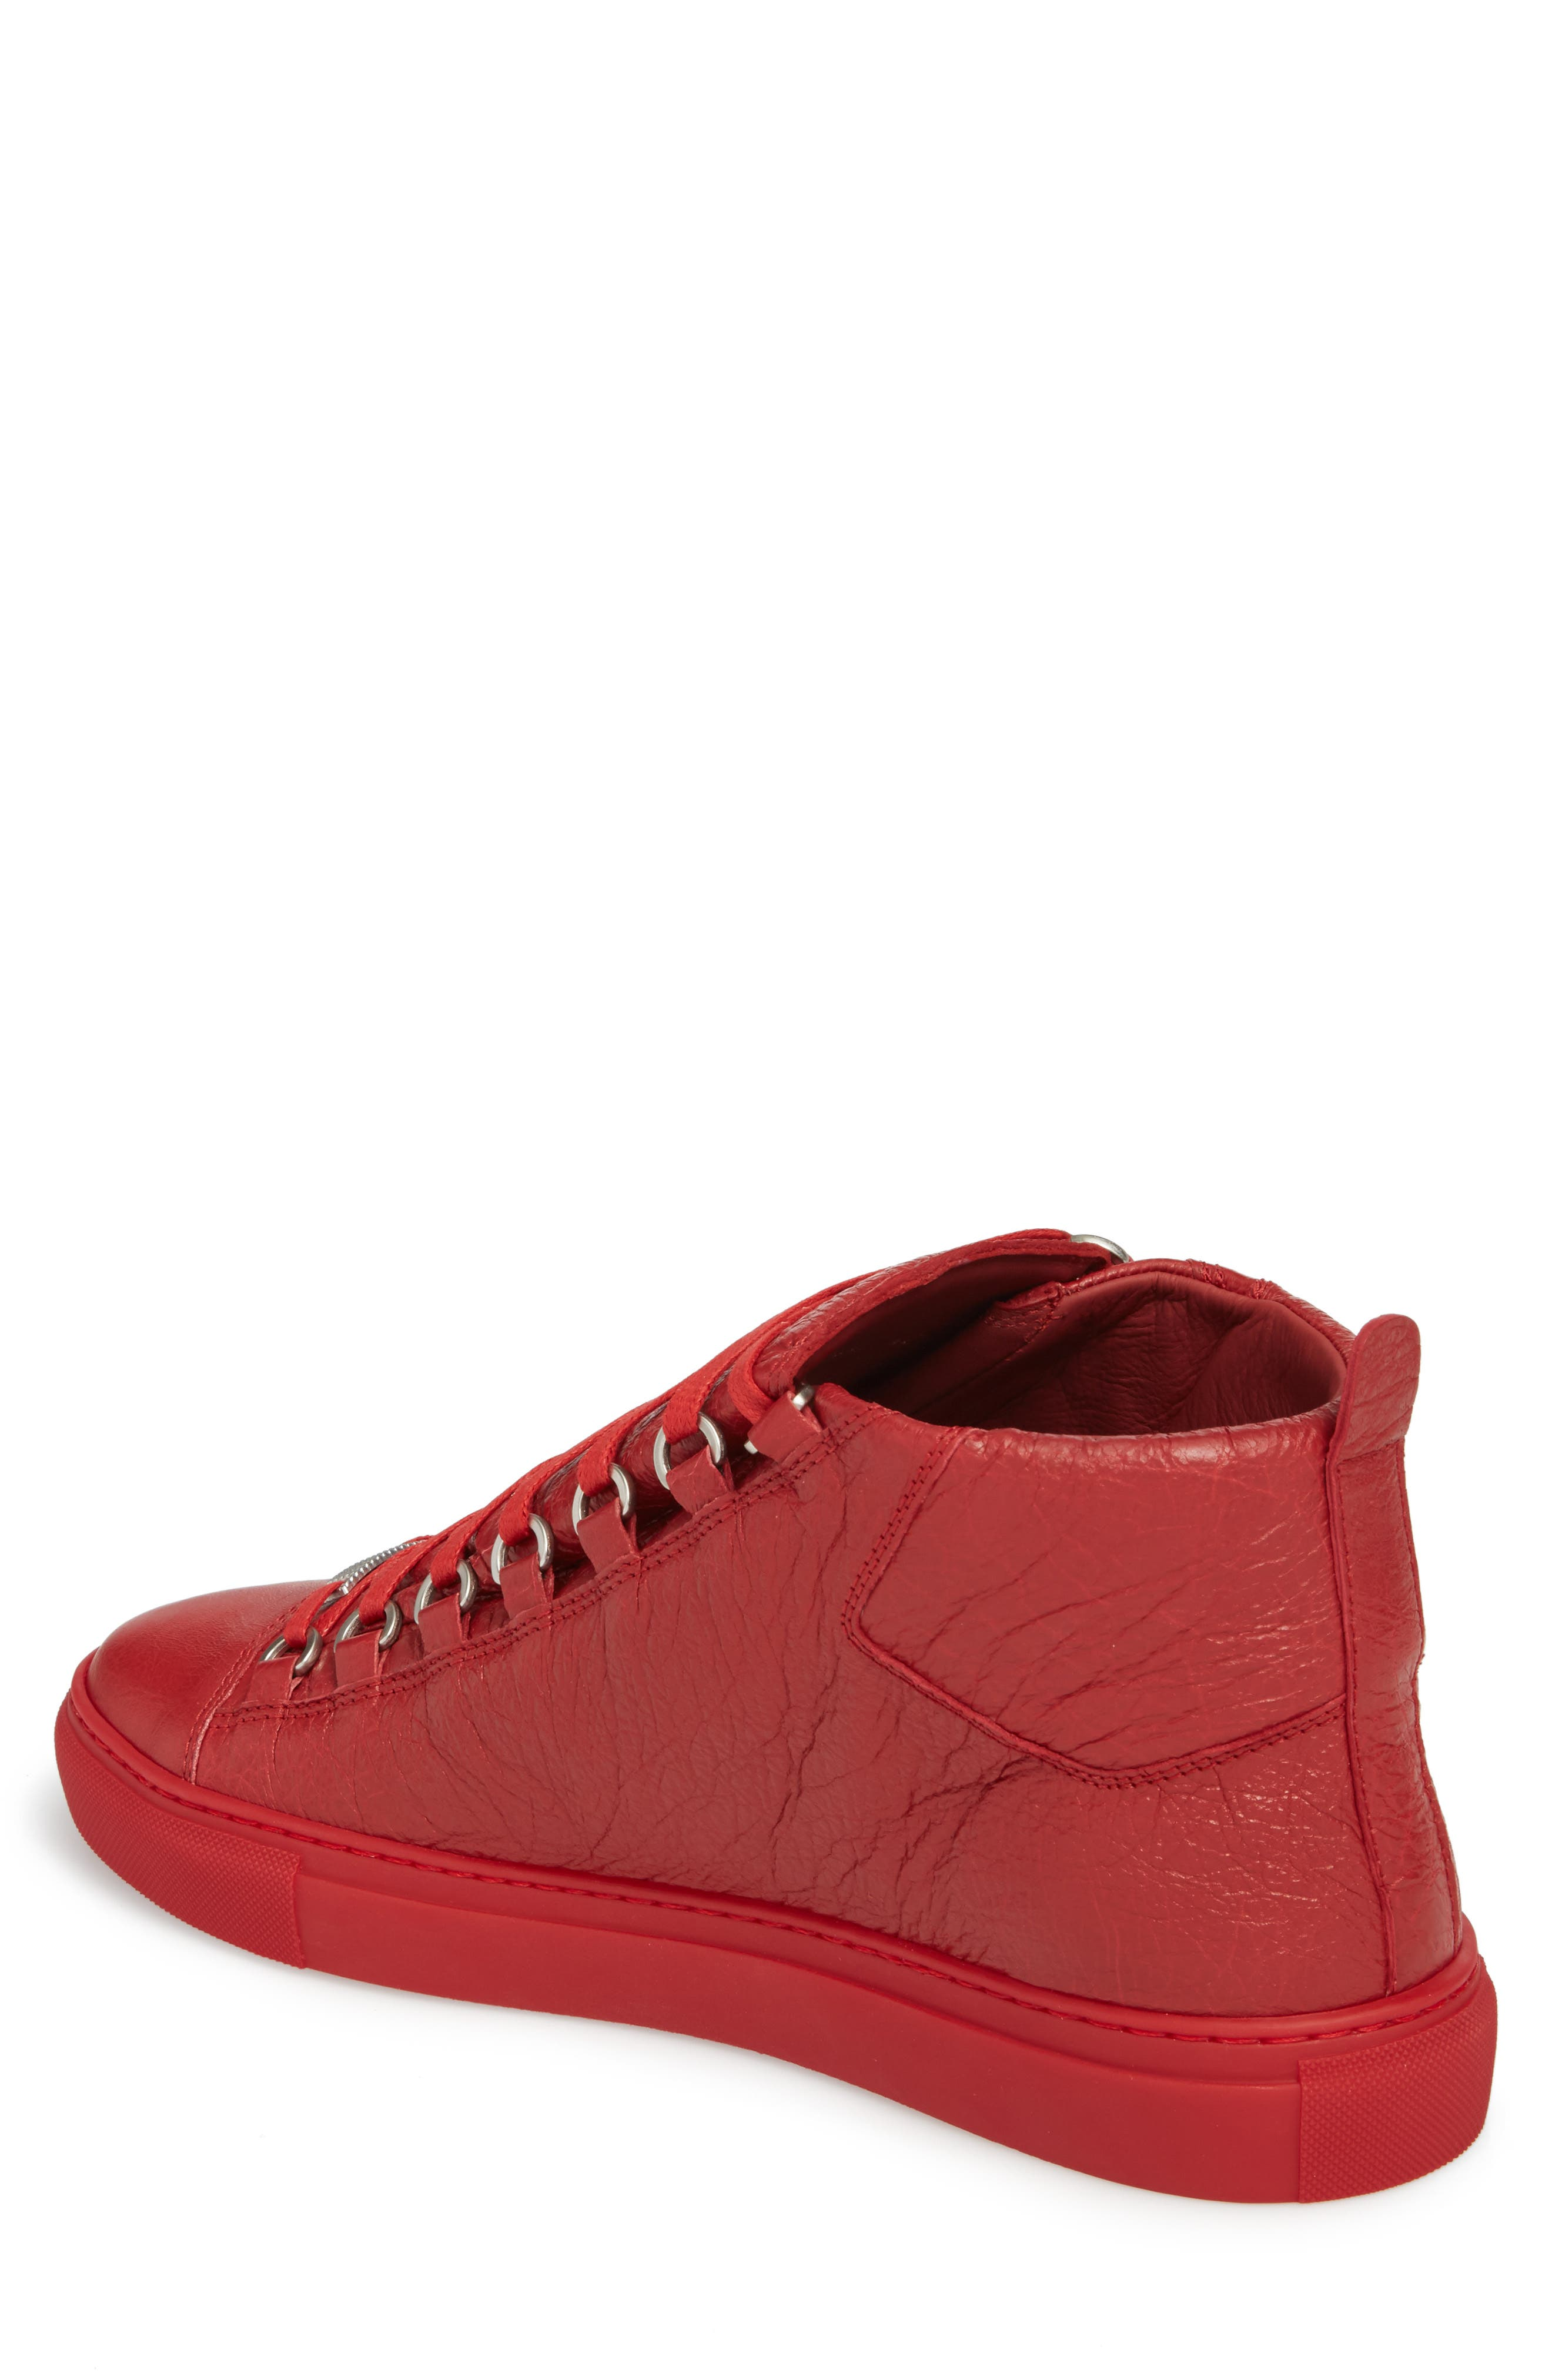 Arena High Sneaker,                             Alternate thumbnail 10, color,